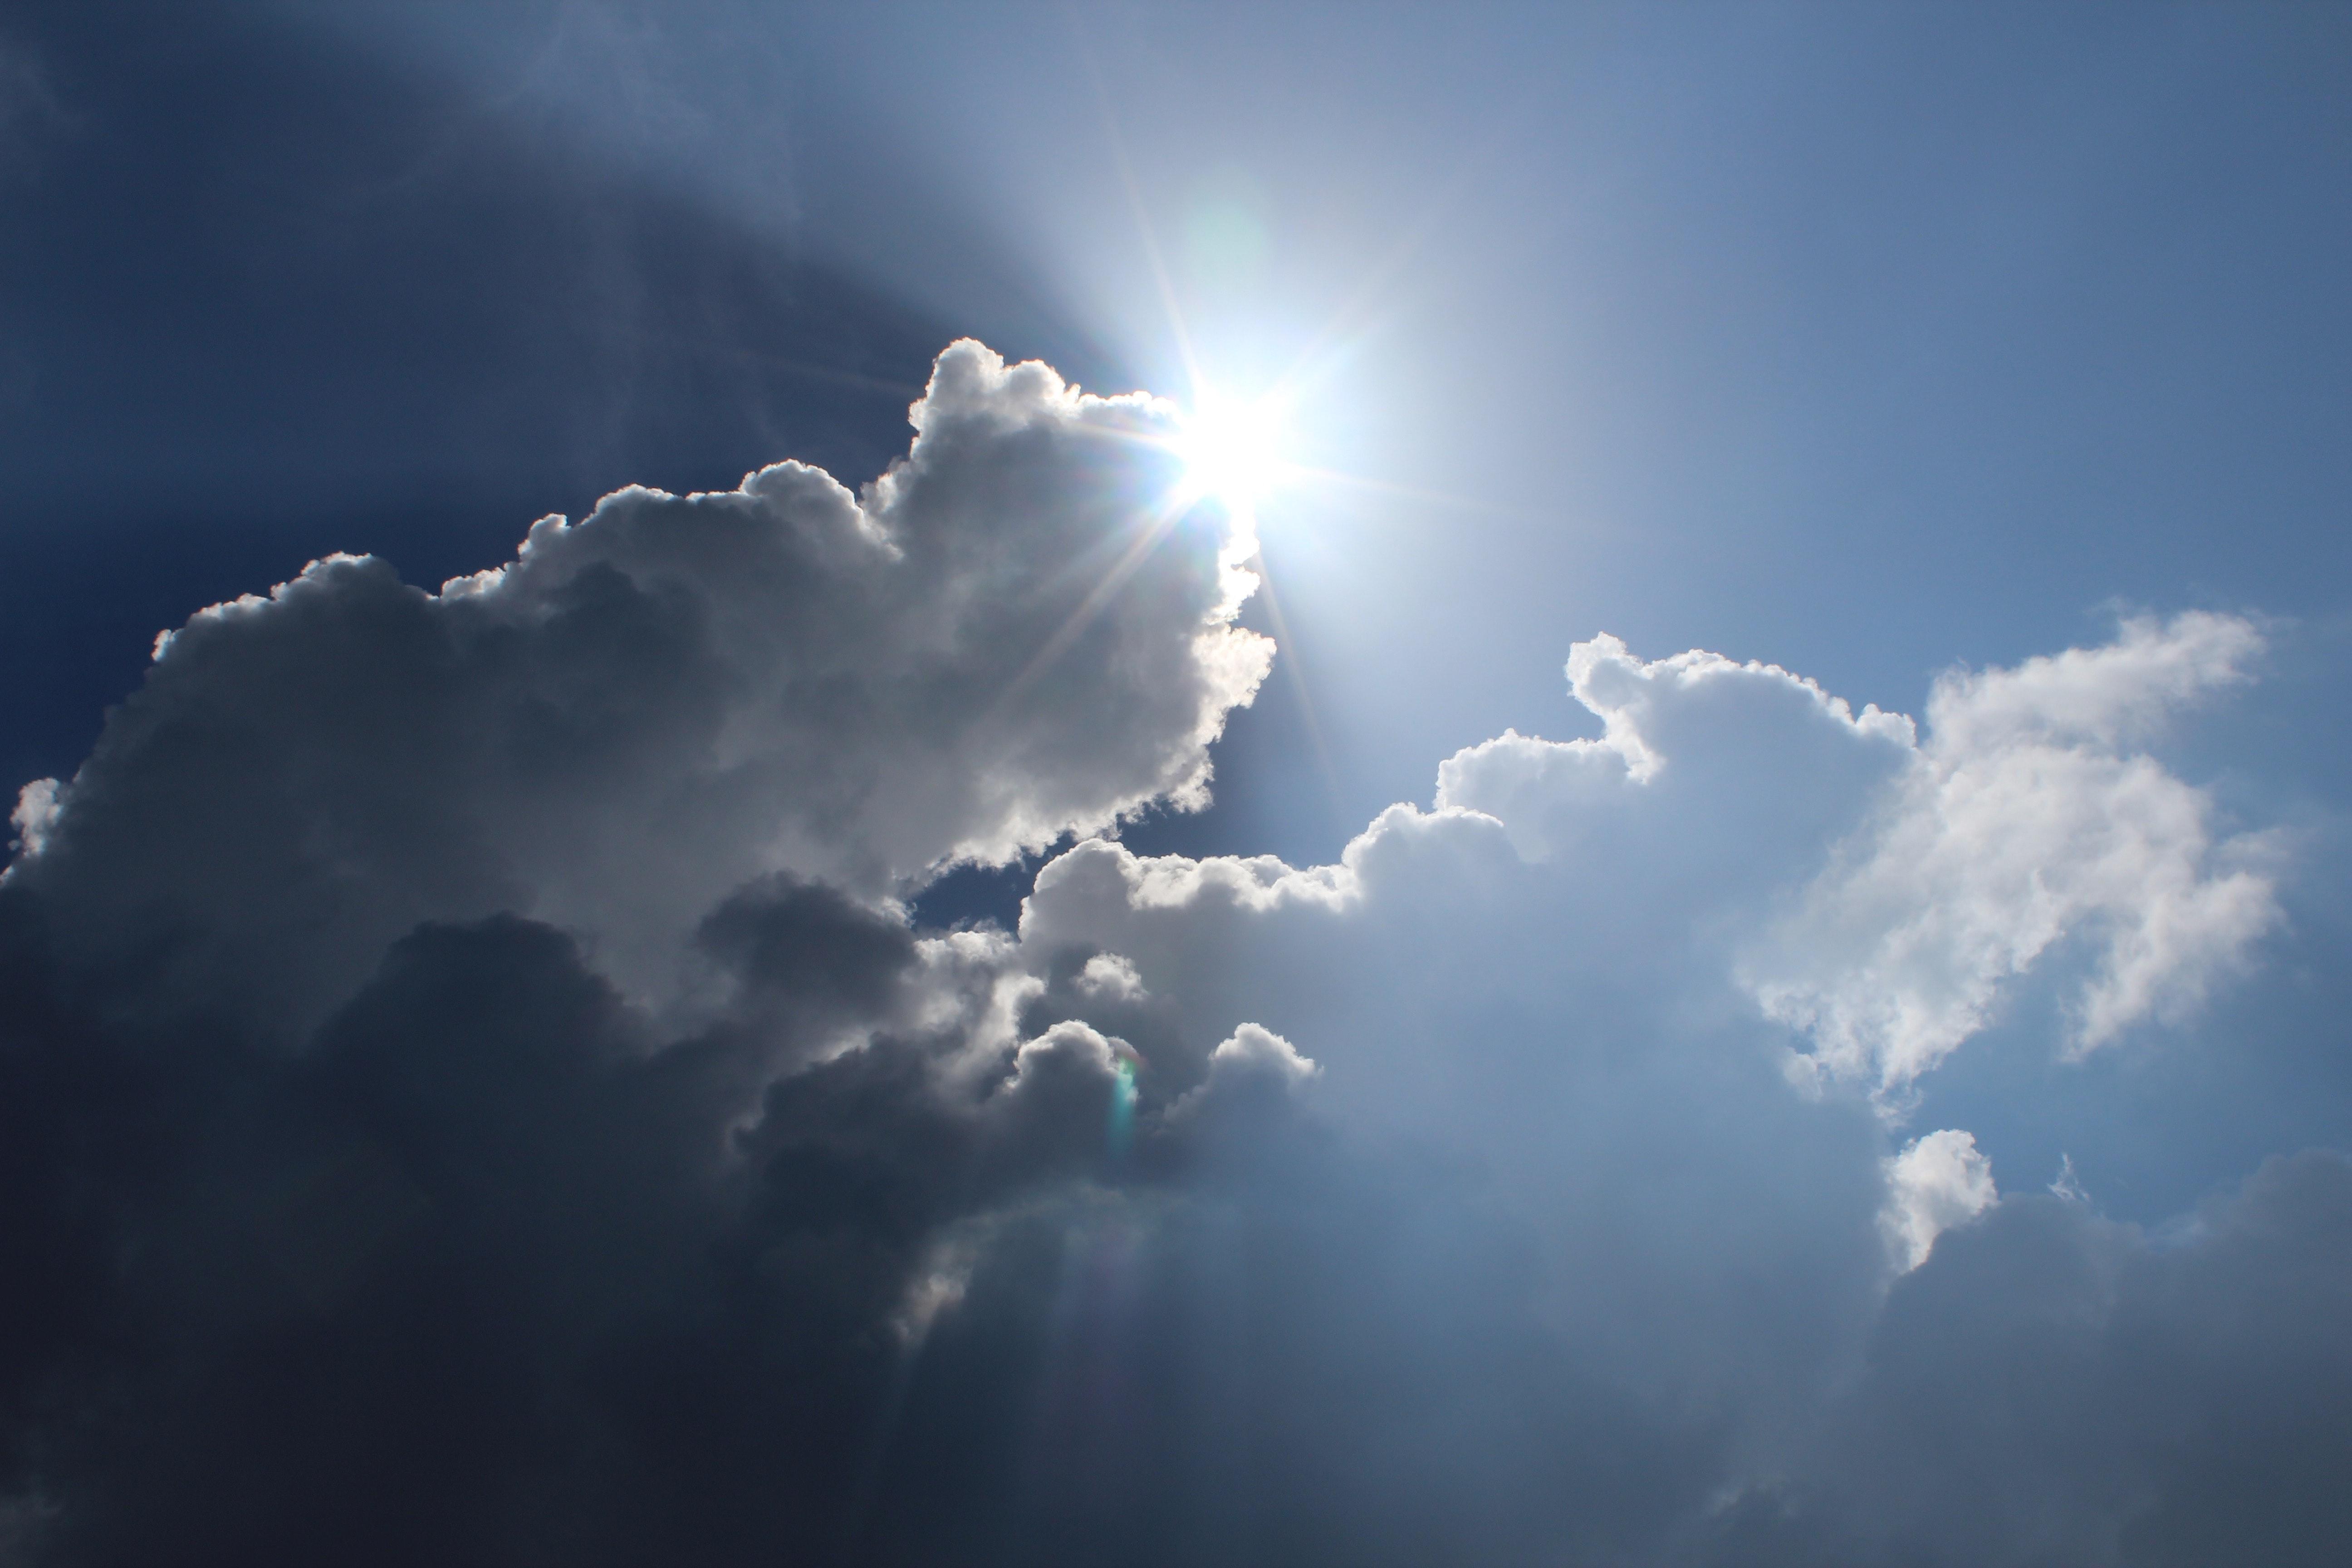 Sun Light Shining Down from the Sky · Free Stock Photo